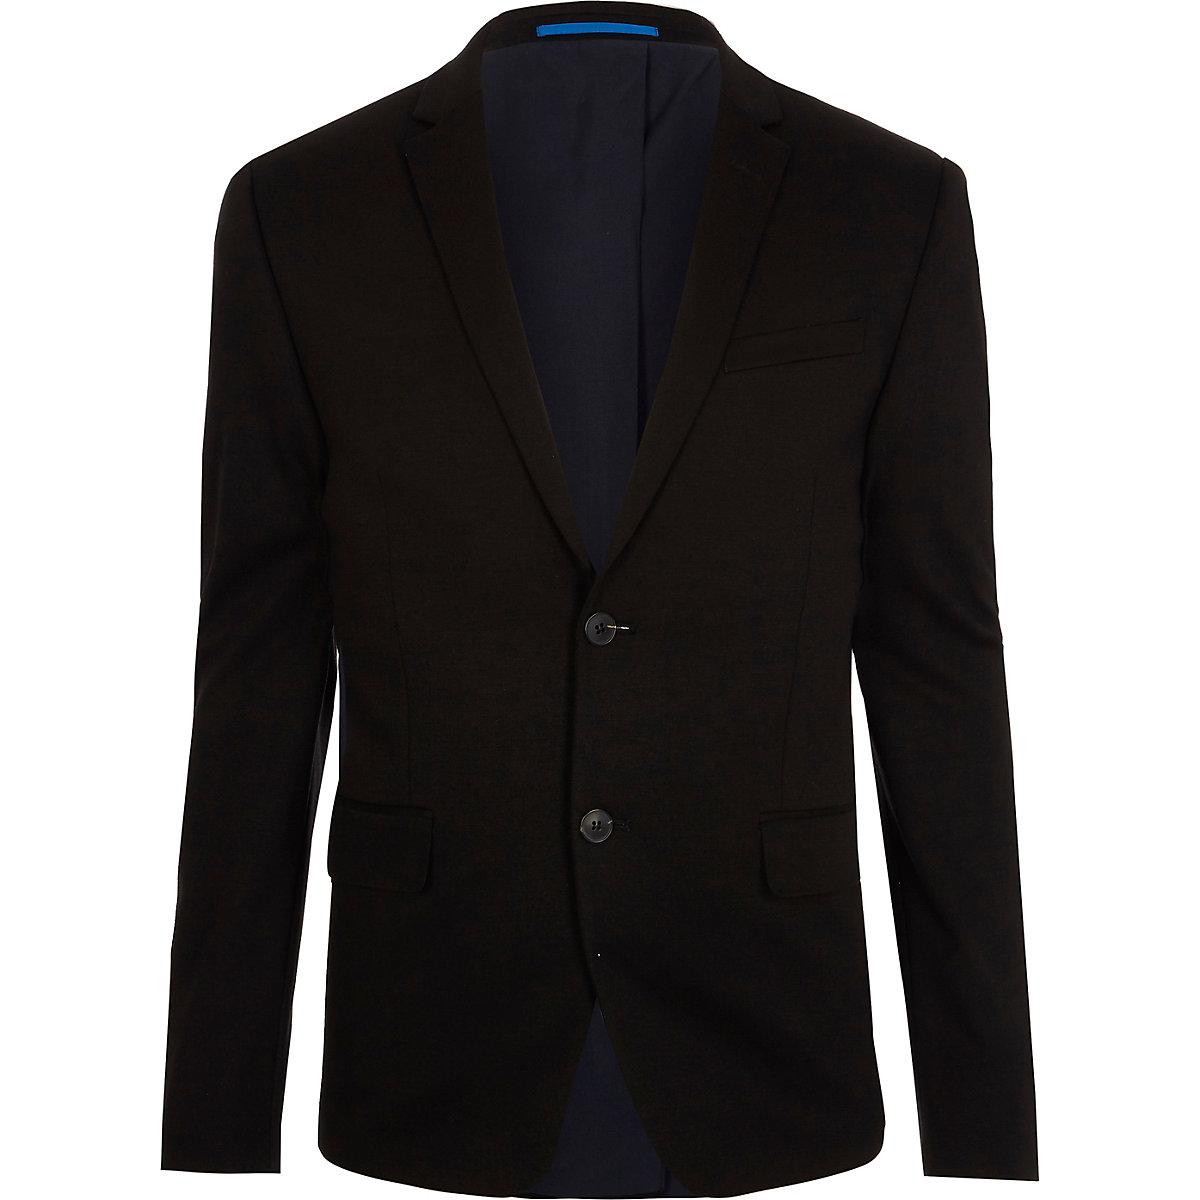 Schwarze Skinny Fit Anzugsjacke